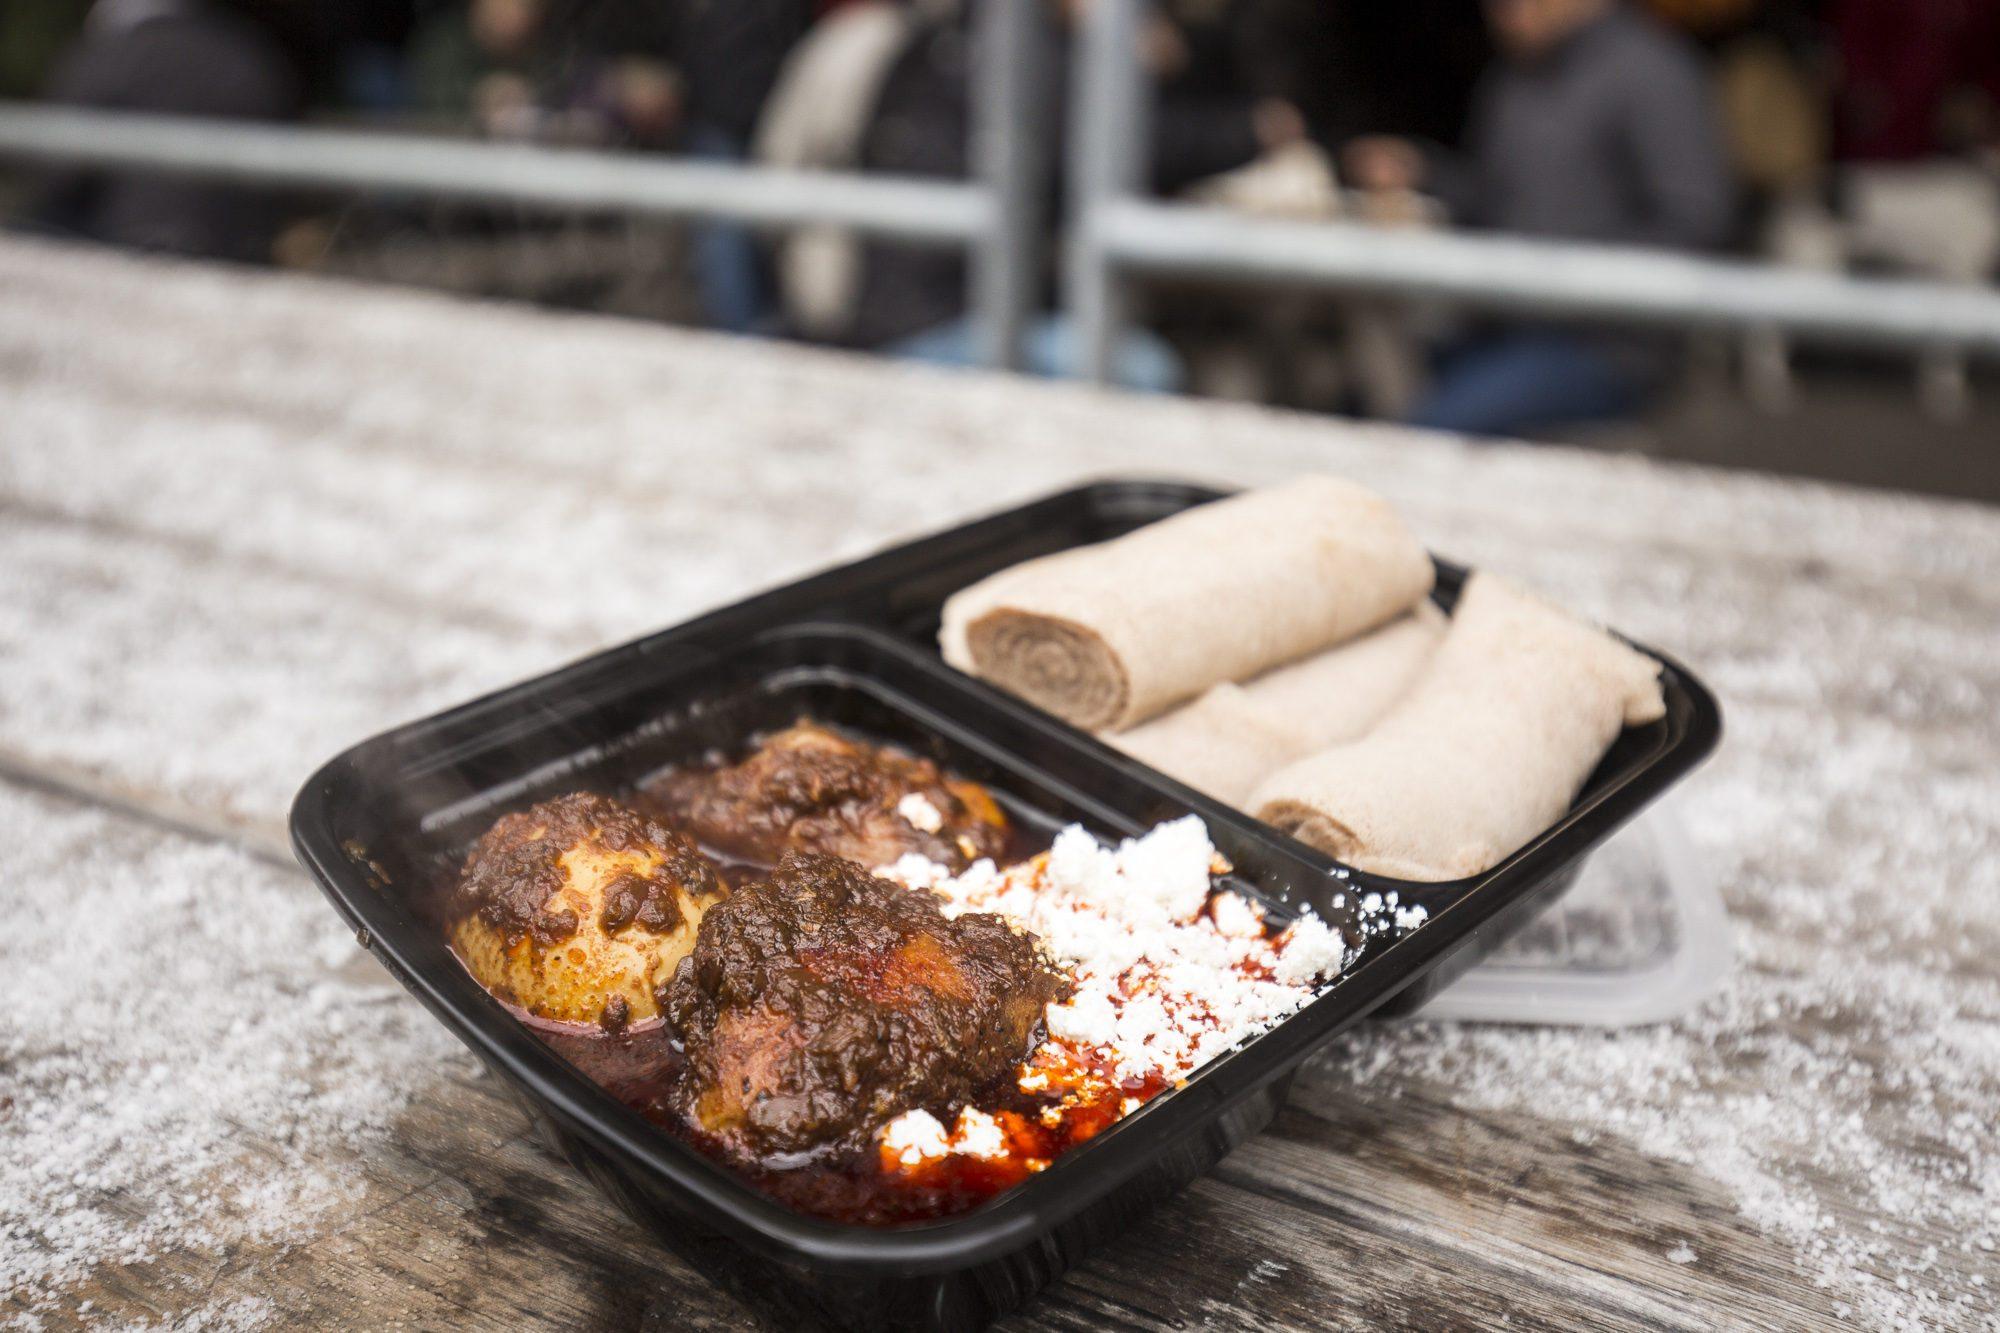 toronto-food-events-evergreen-brick-works-winter-village-christmas-market-the-spicy-ethiopian